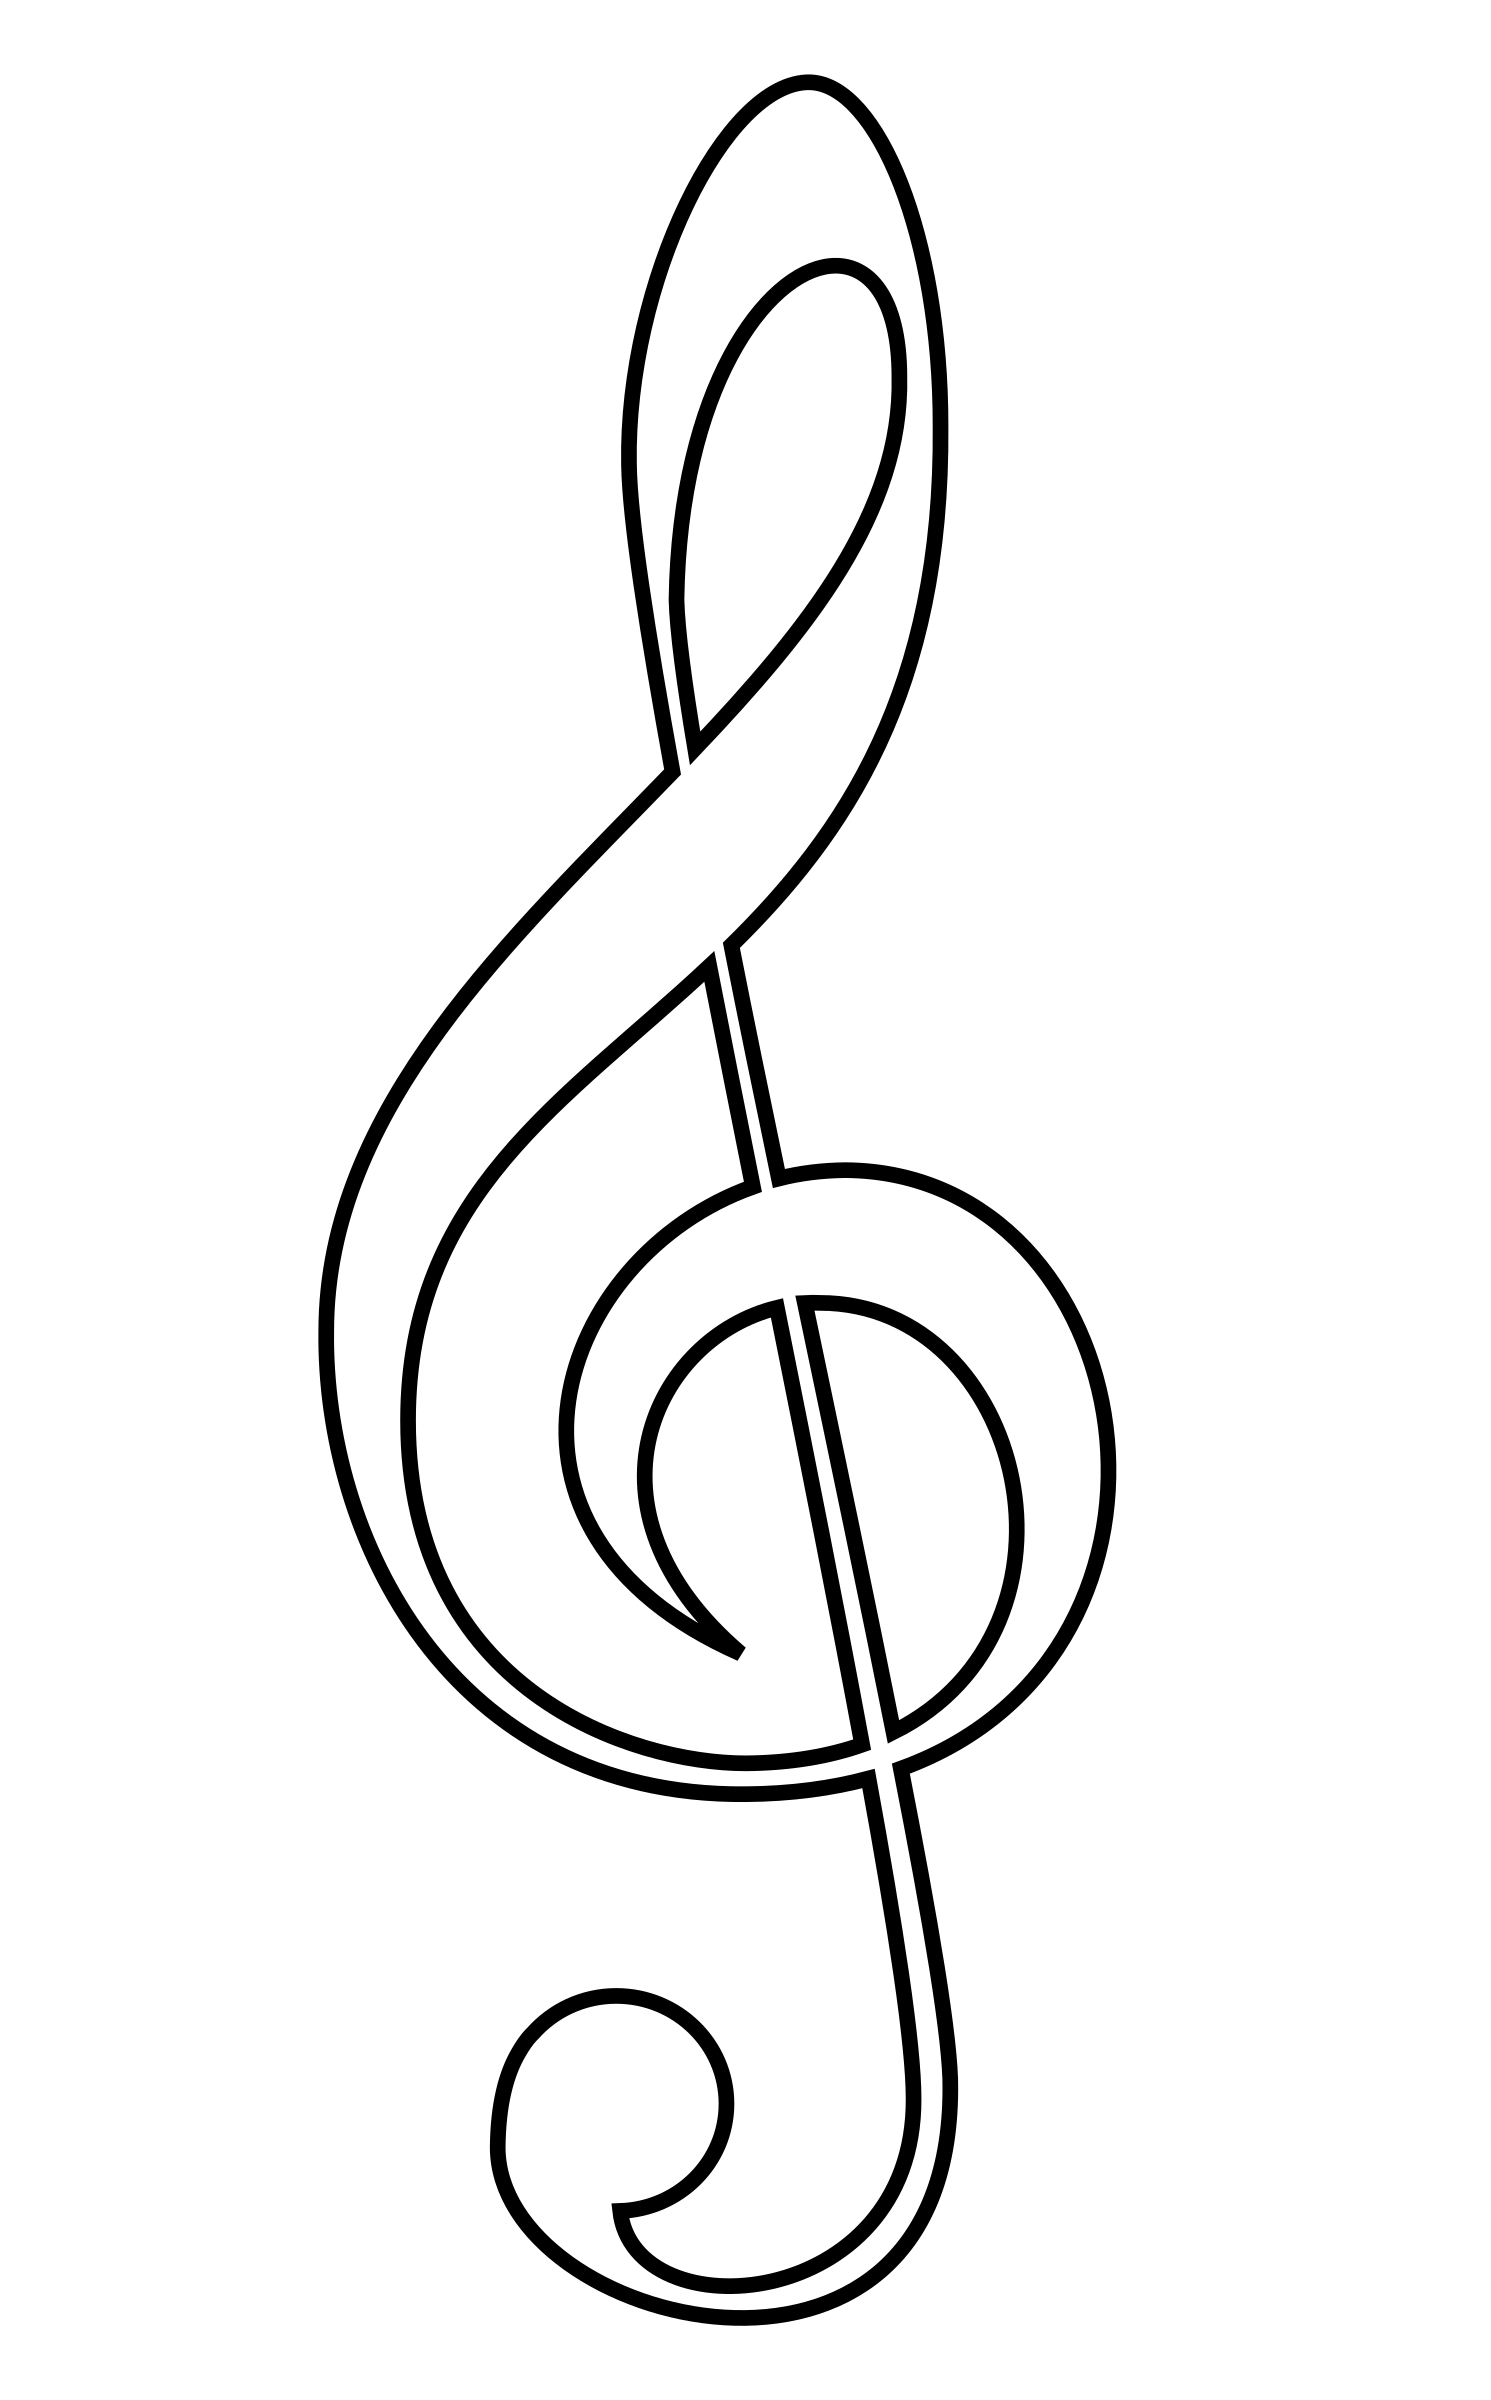 vector transparent download Treble clef clipart. Big image png